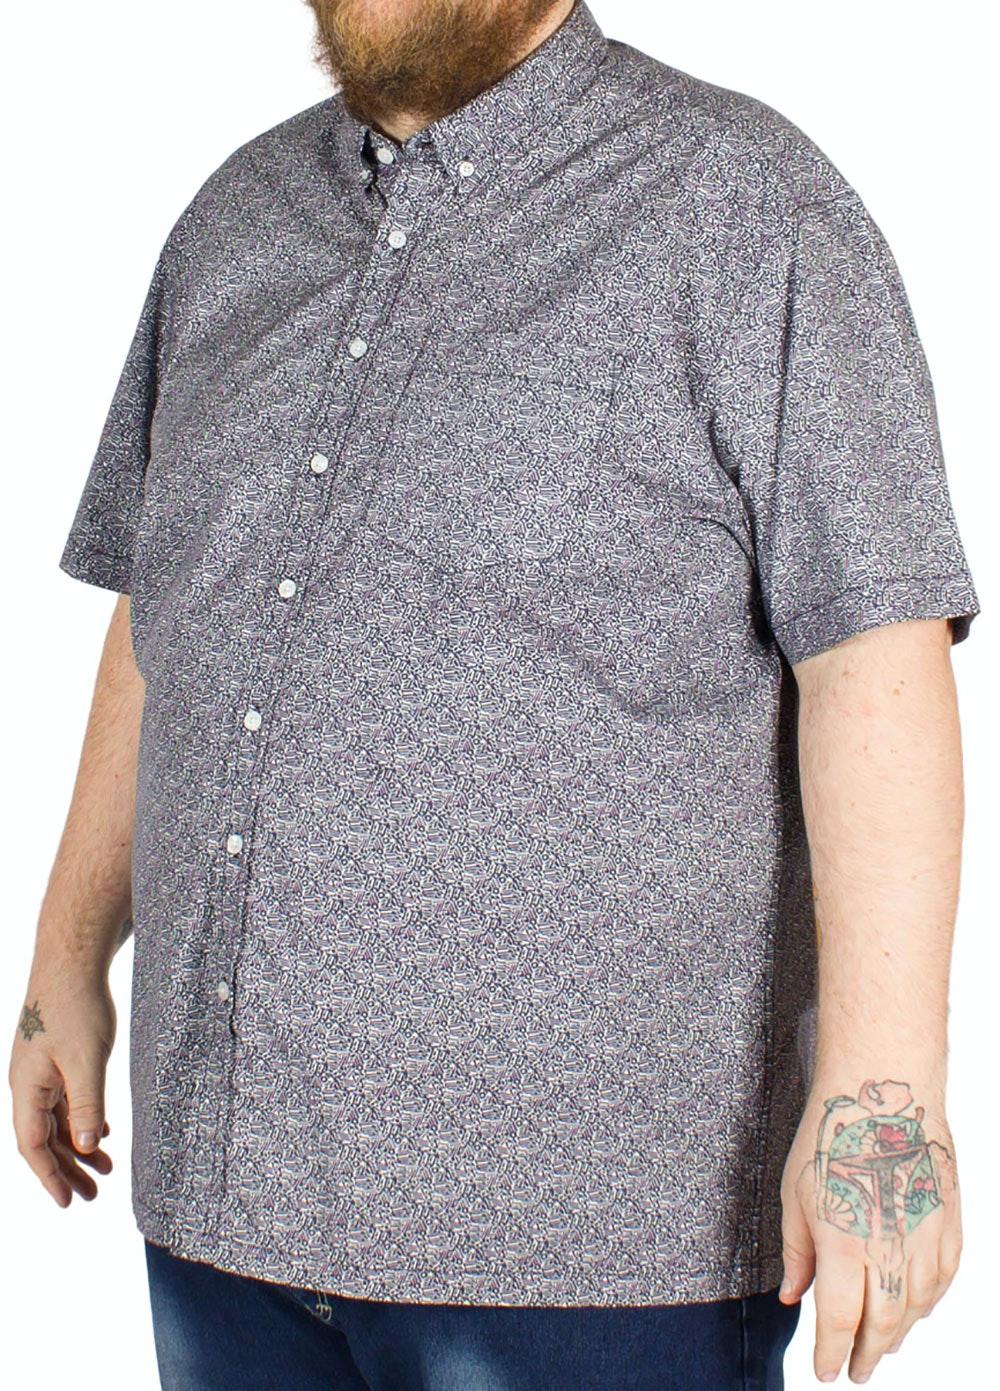 Bigdude Abstract Pattern Short Sleeve Shirt Navy